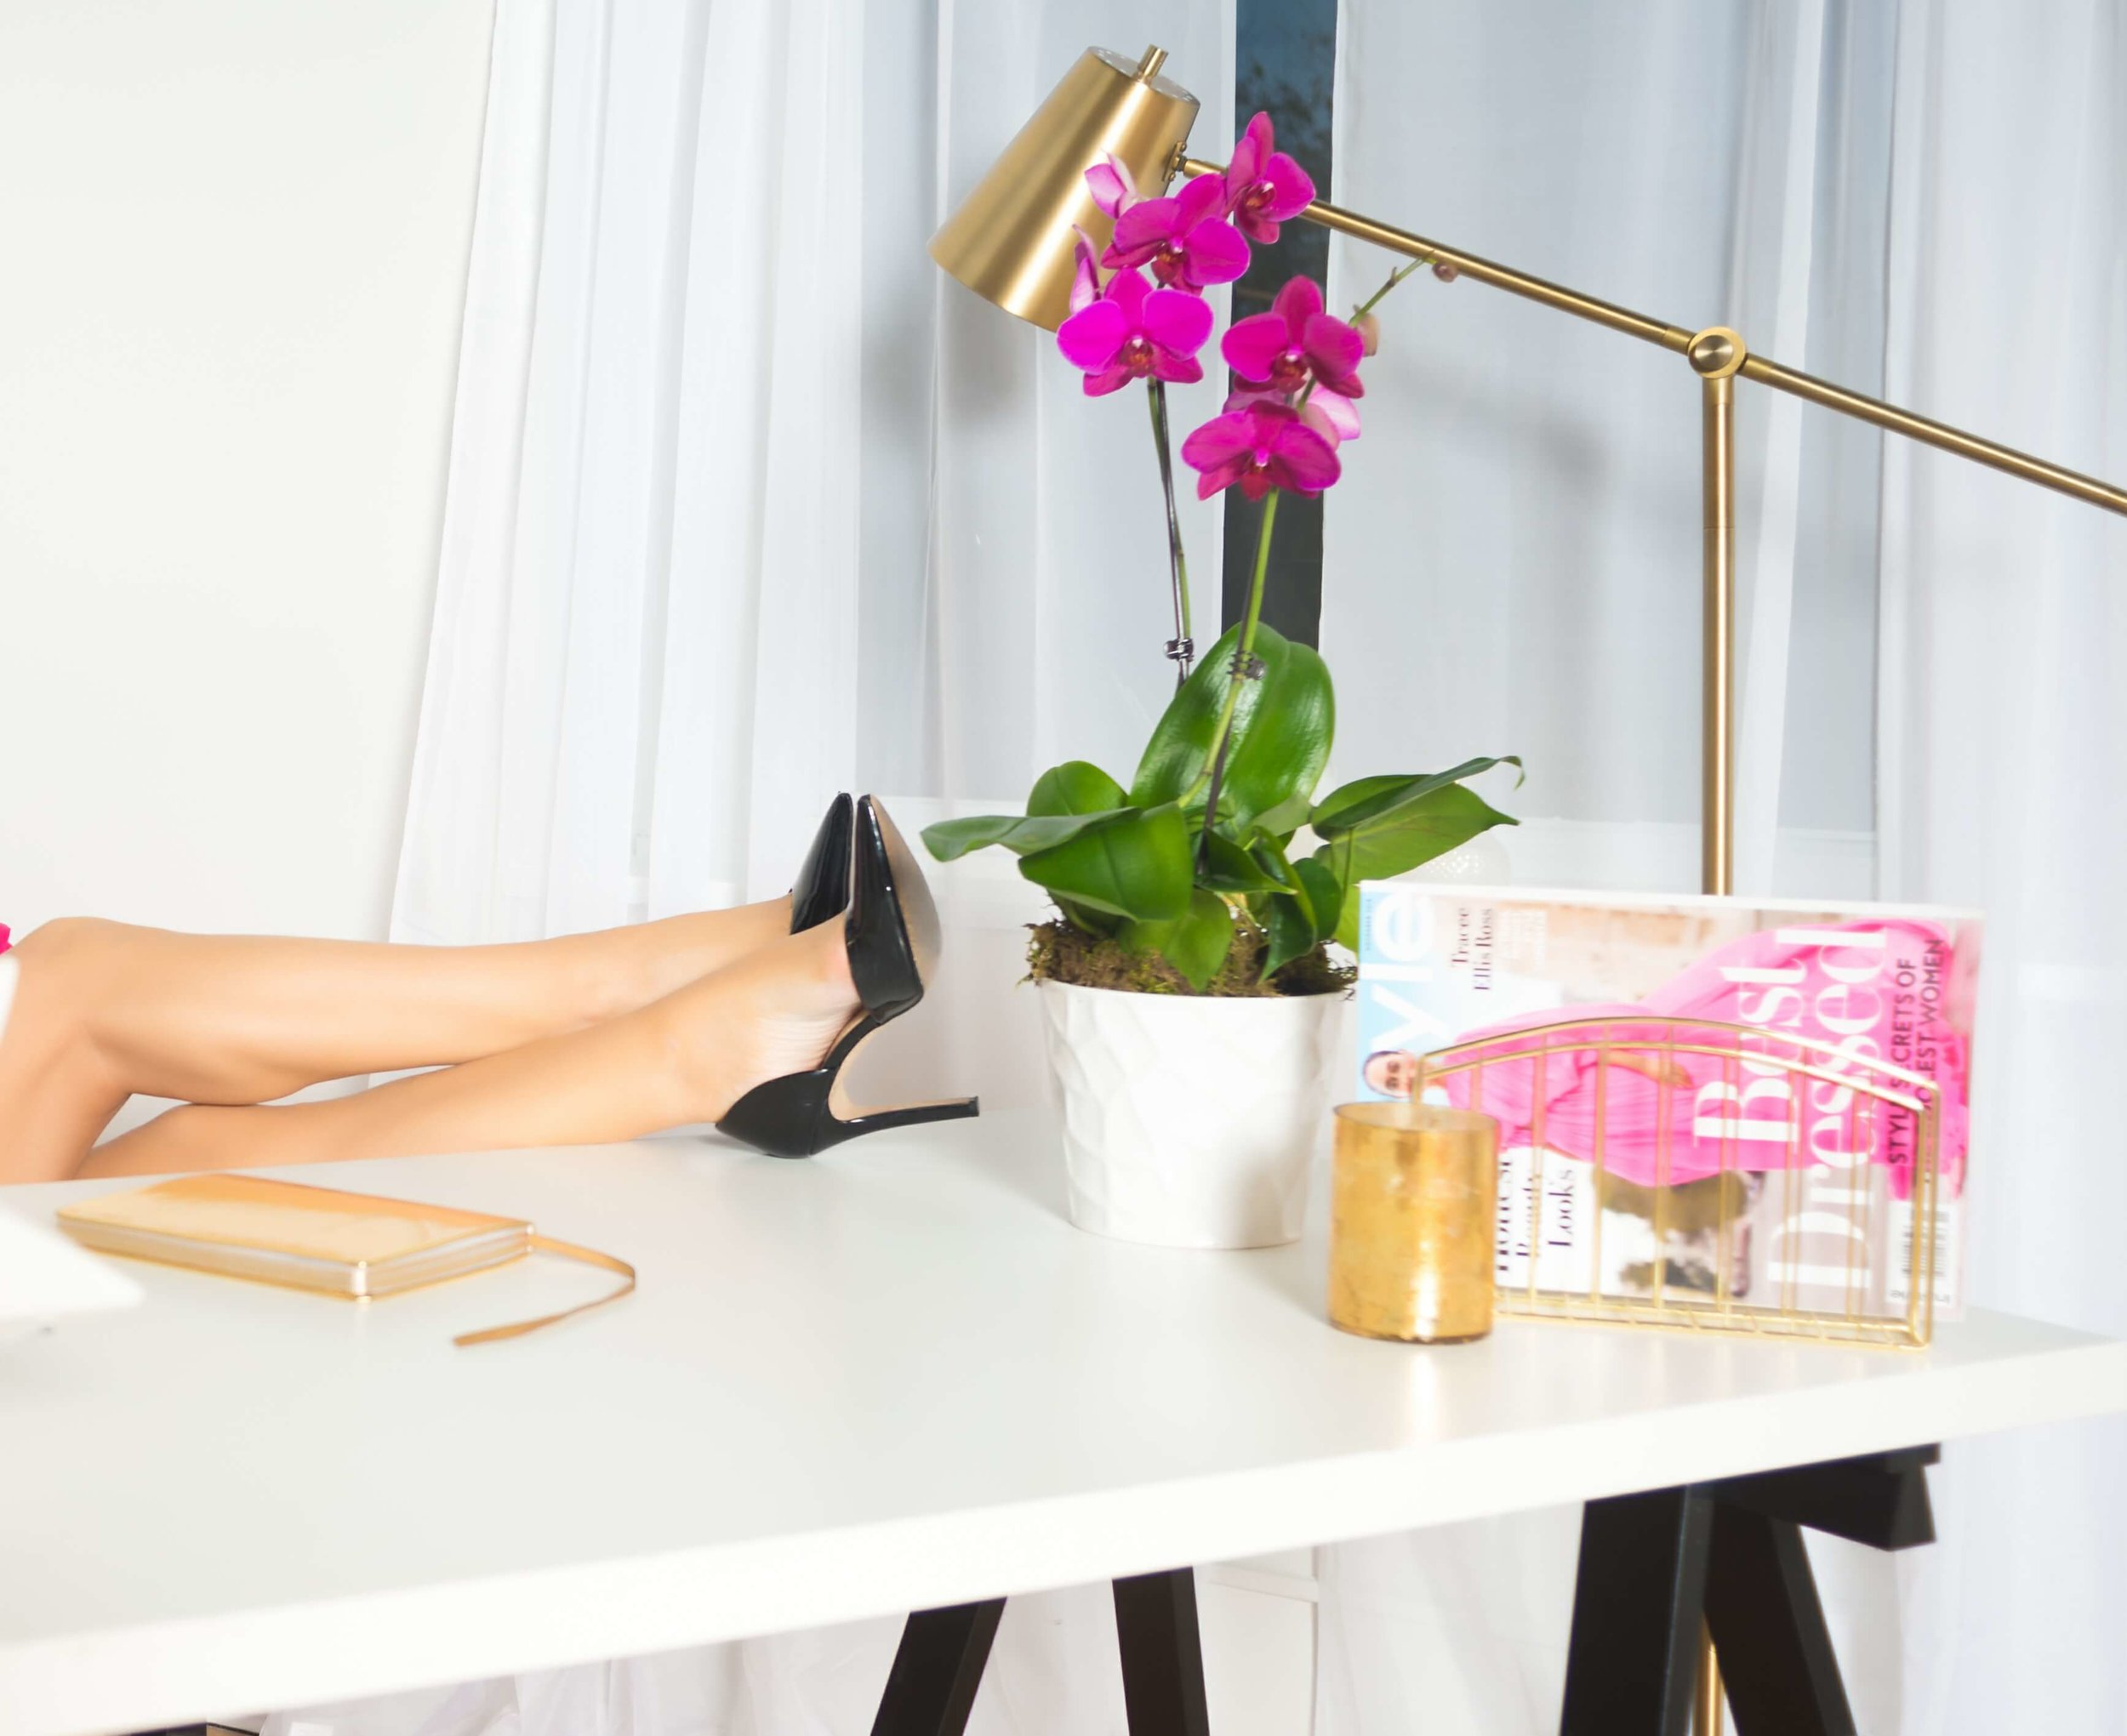 Chanel Nicole _ Louisville Photographer Stilettos With Soul.jpg